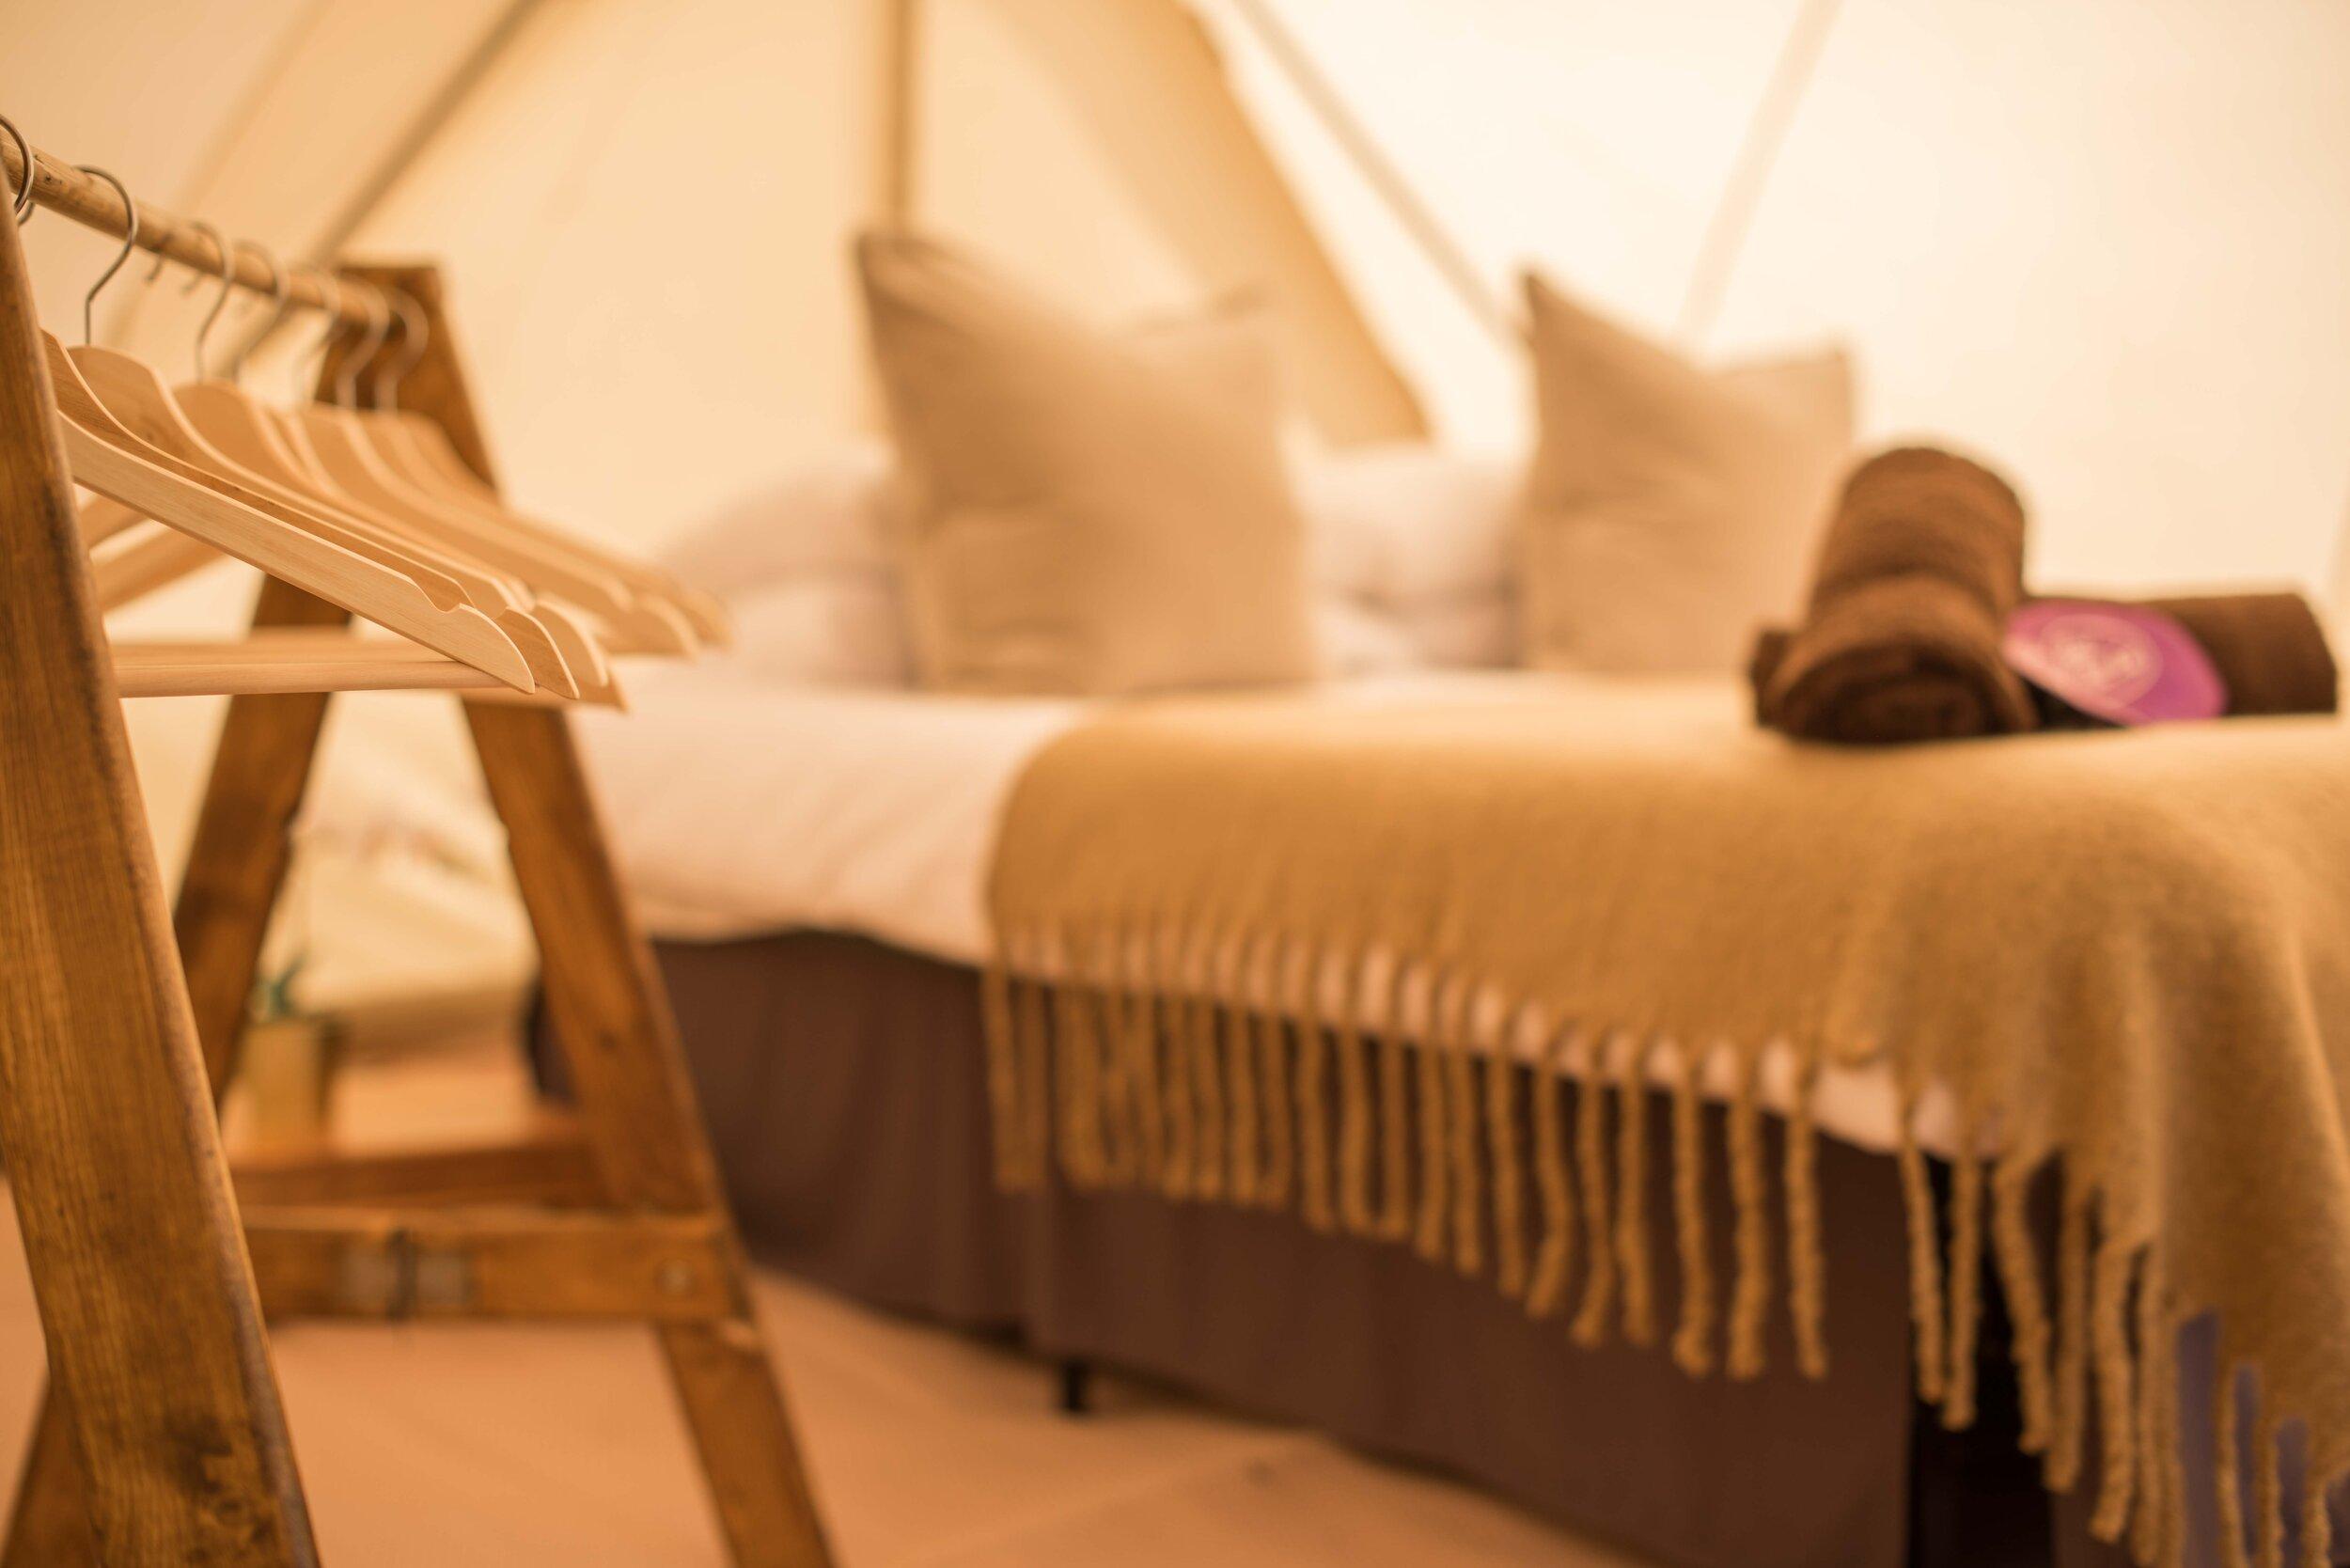 5, hotel-bell-tent-superbell-package-5.jpg